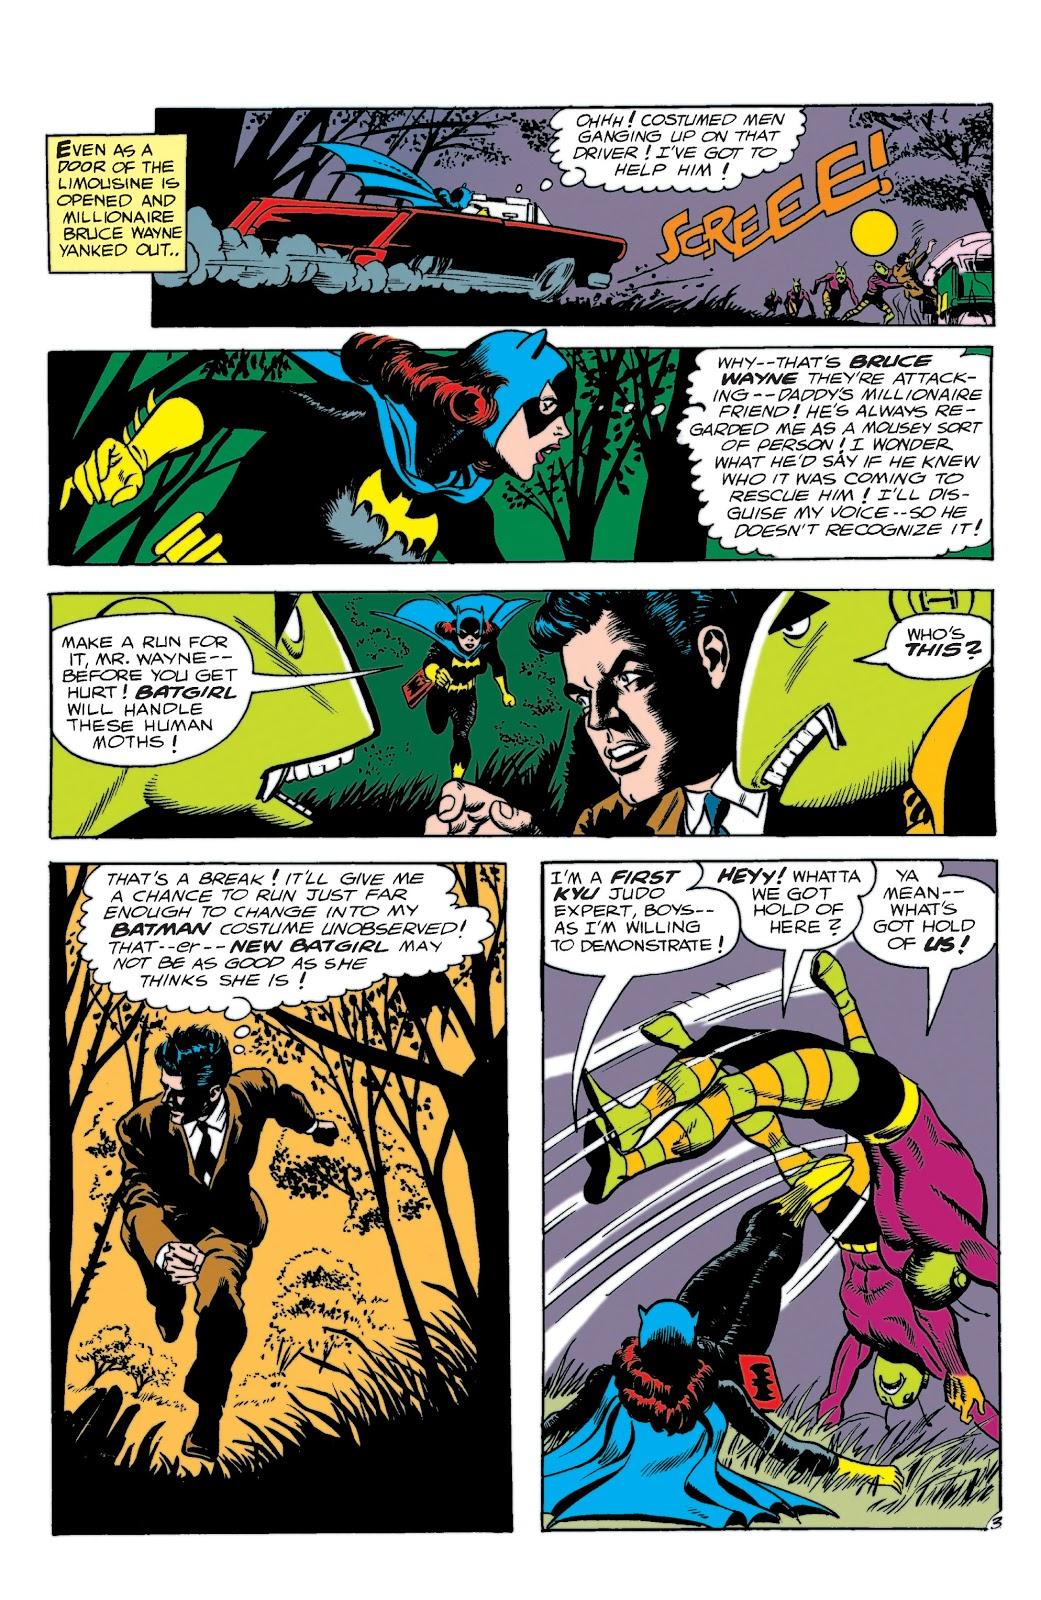 Batgirl saves Bruce Wayne